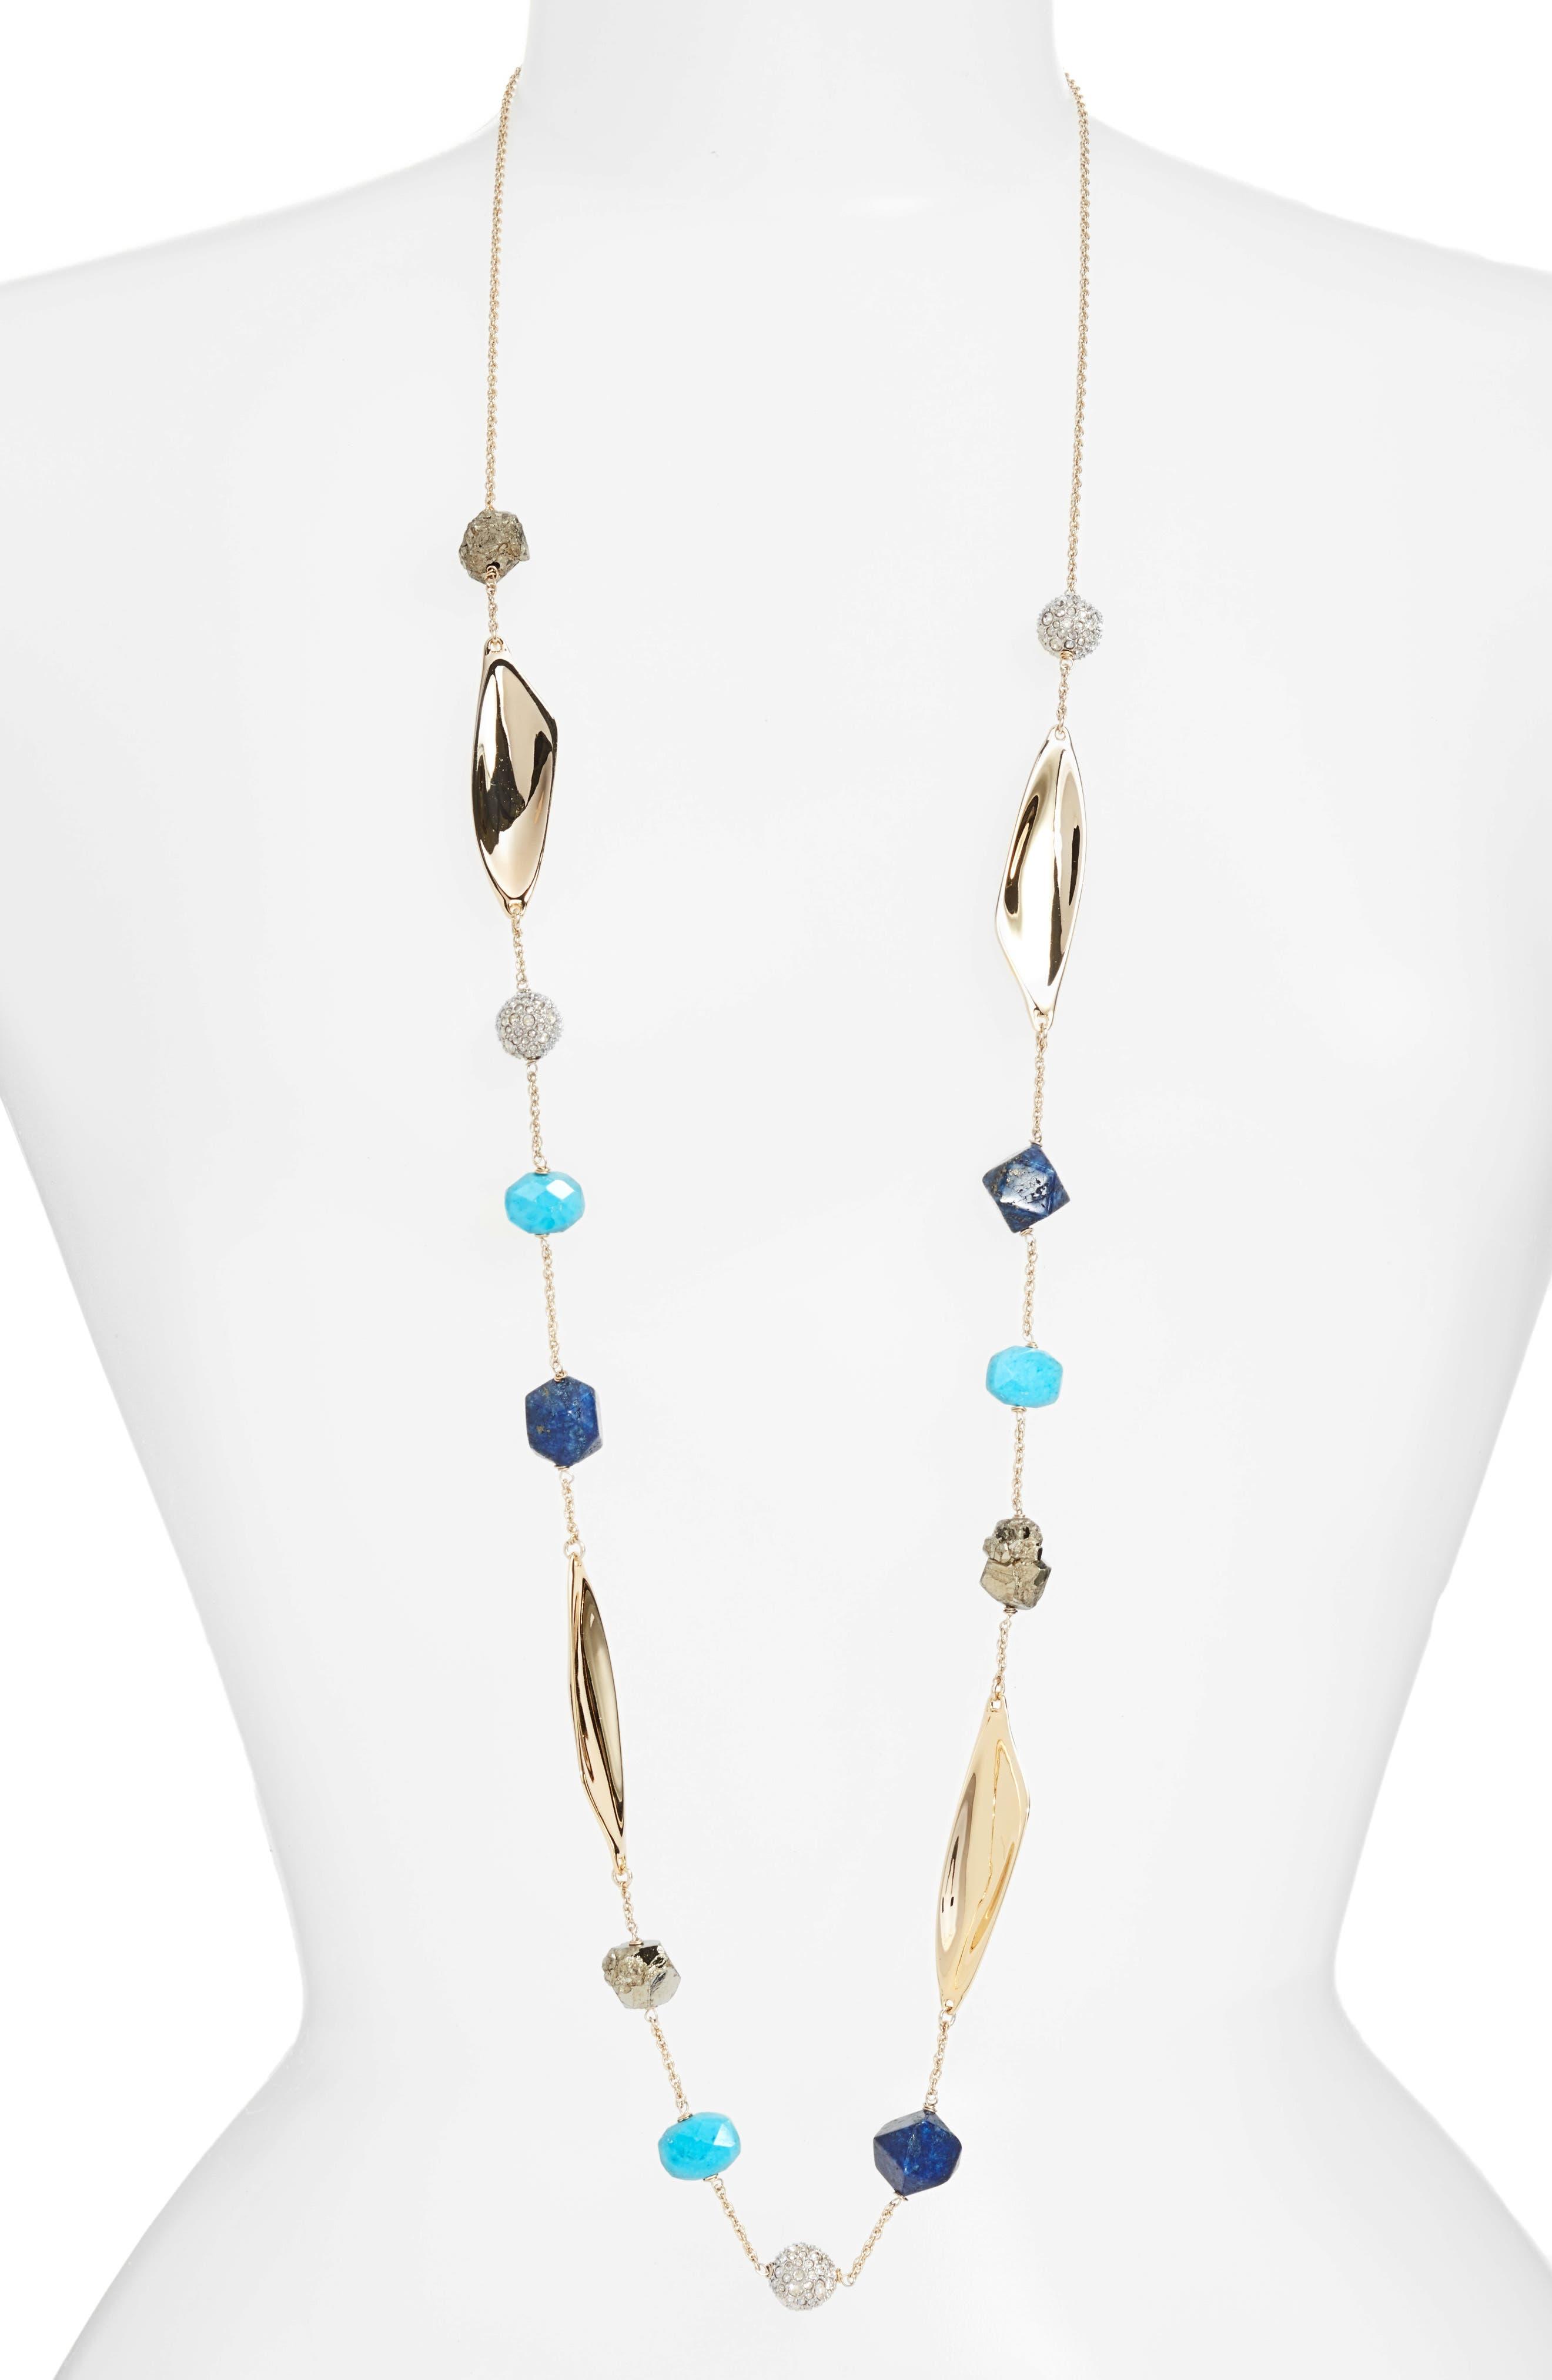 Alexis Bittar Long Beaded Necklace